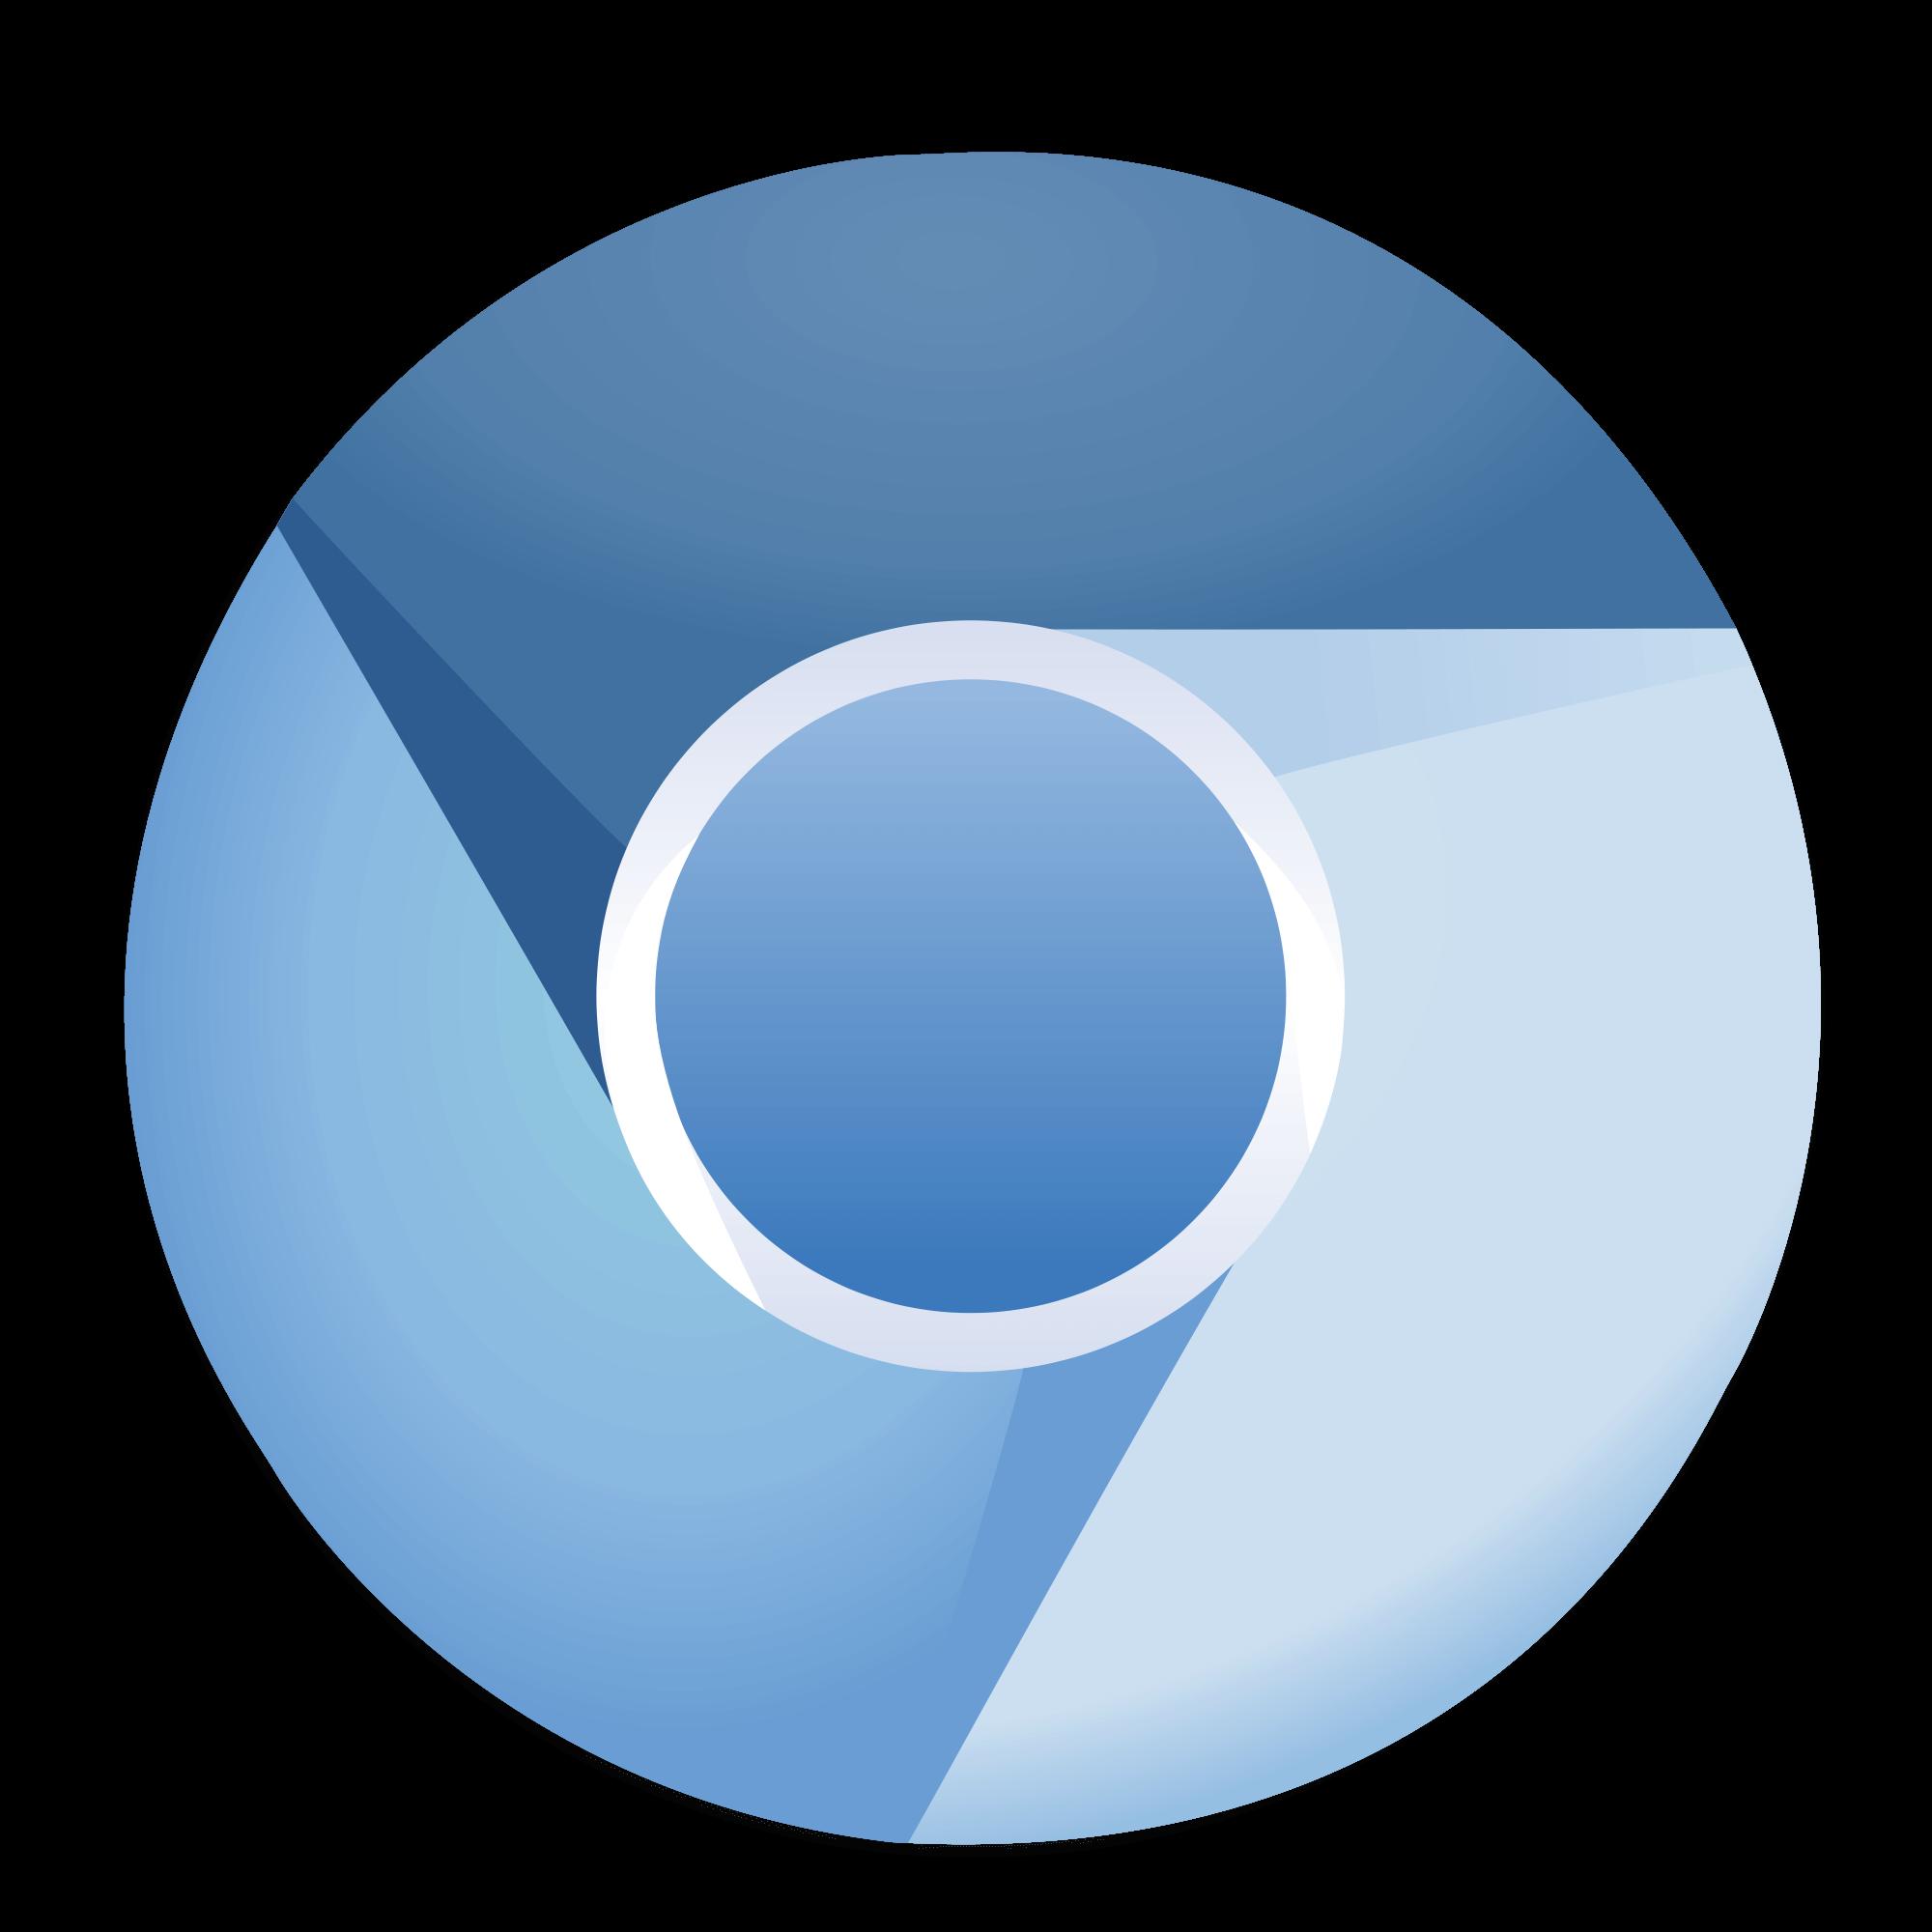 Chrome Os Commit Archives Clintonfitch